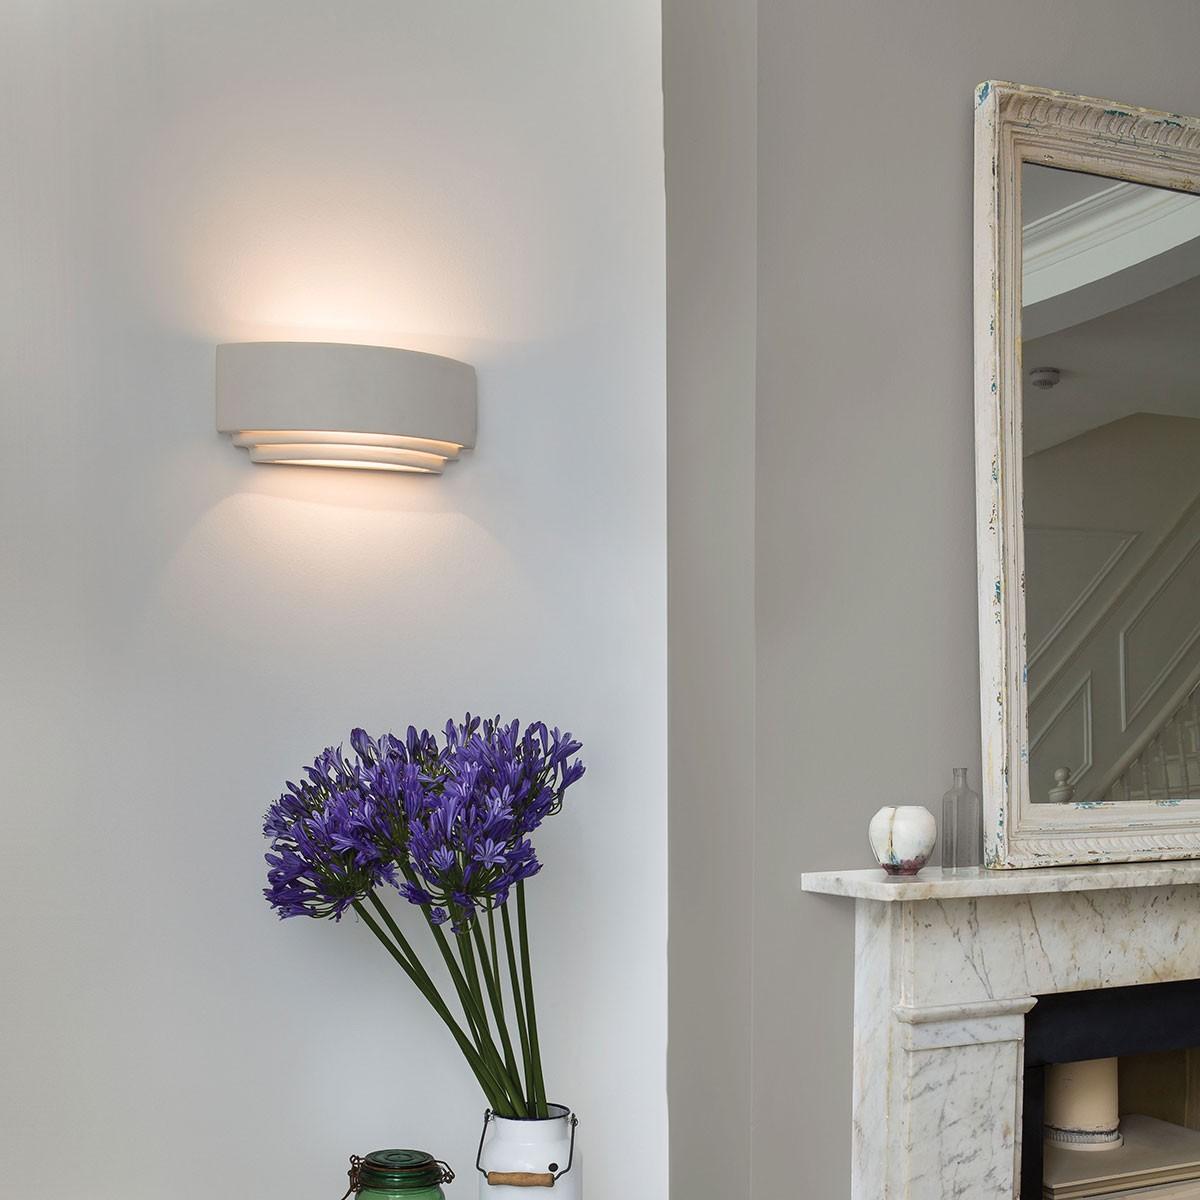 Astro Amalfi Ceramic Wall Light At UK Electrical Supplies